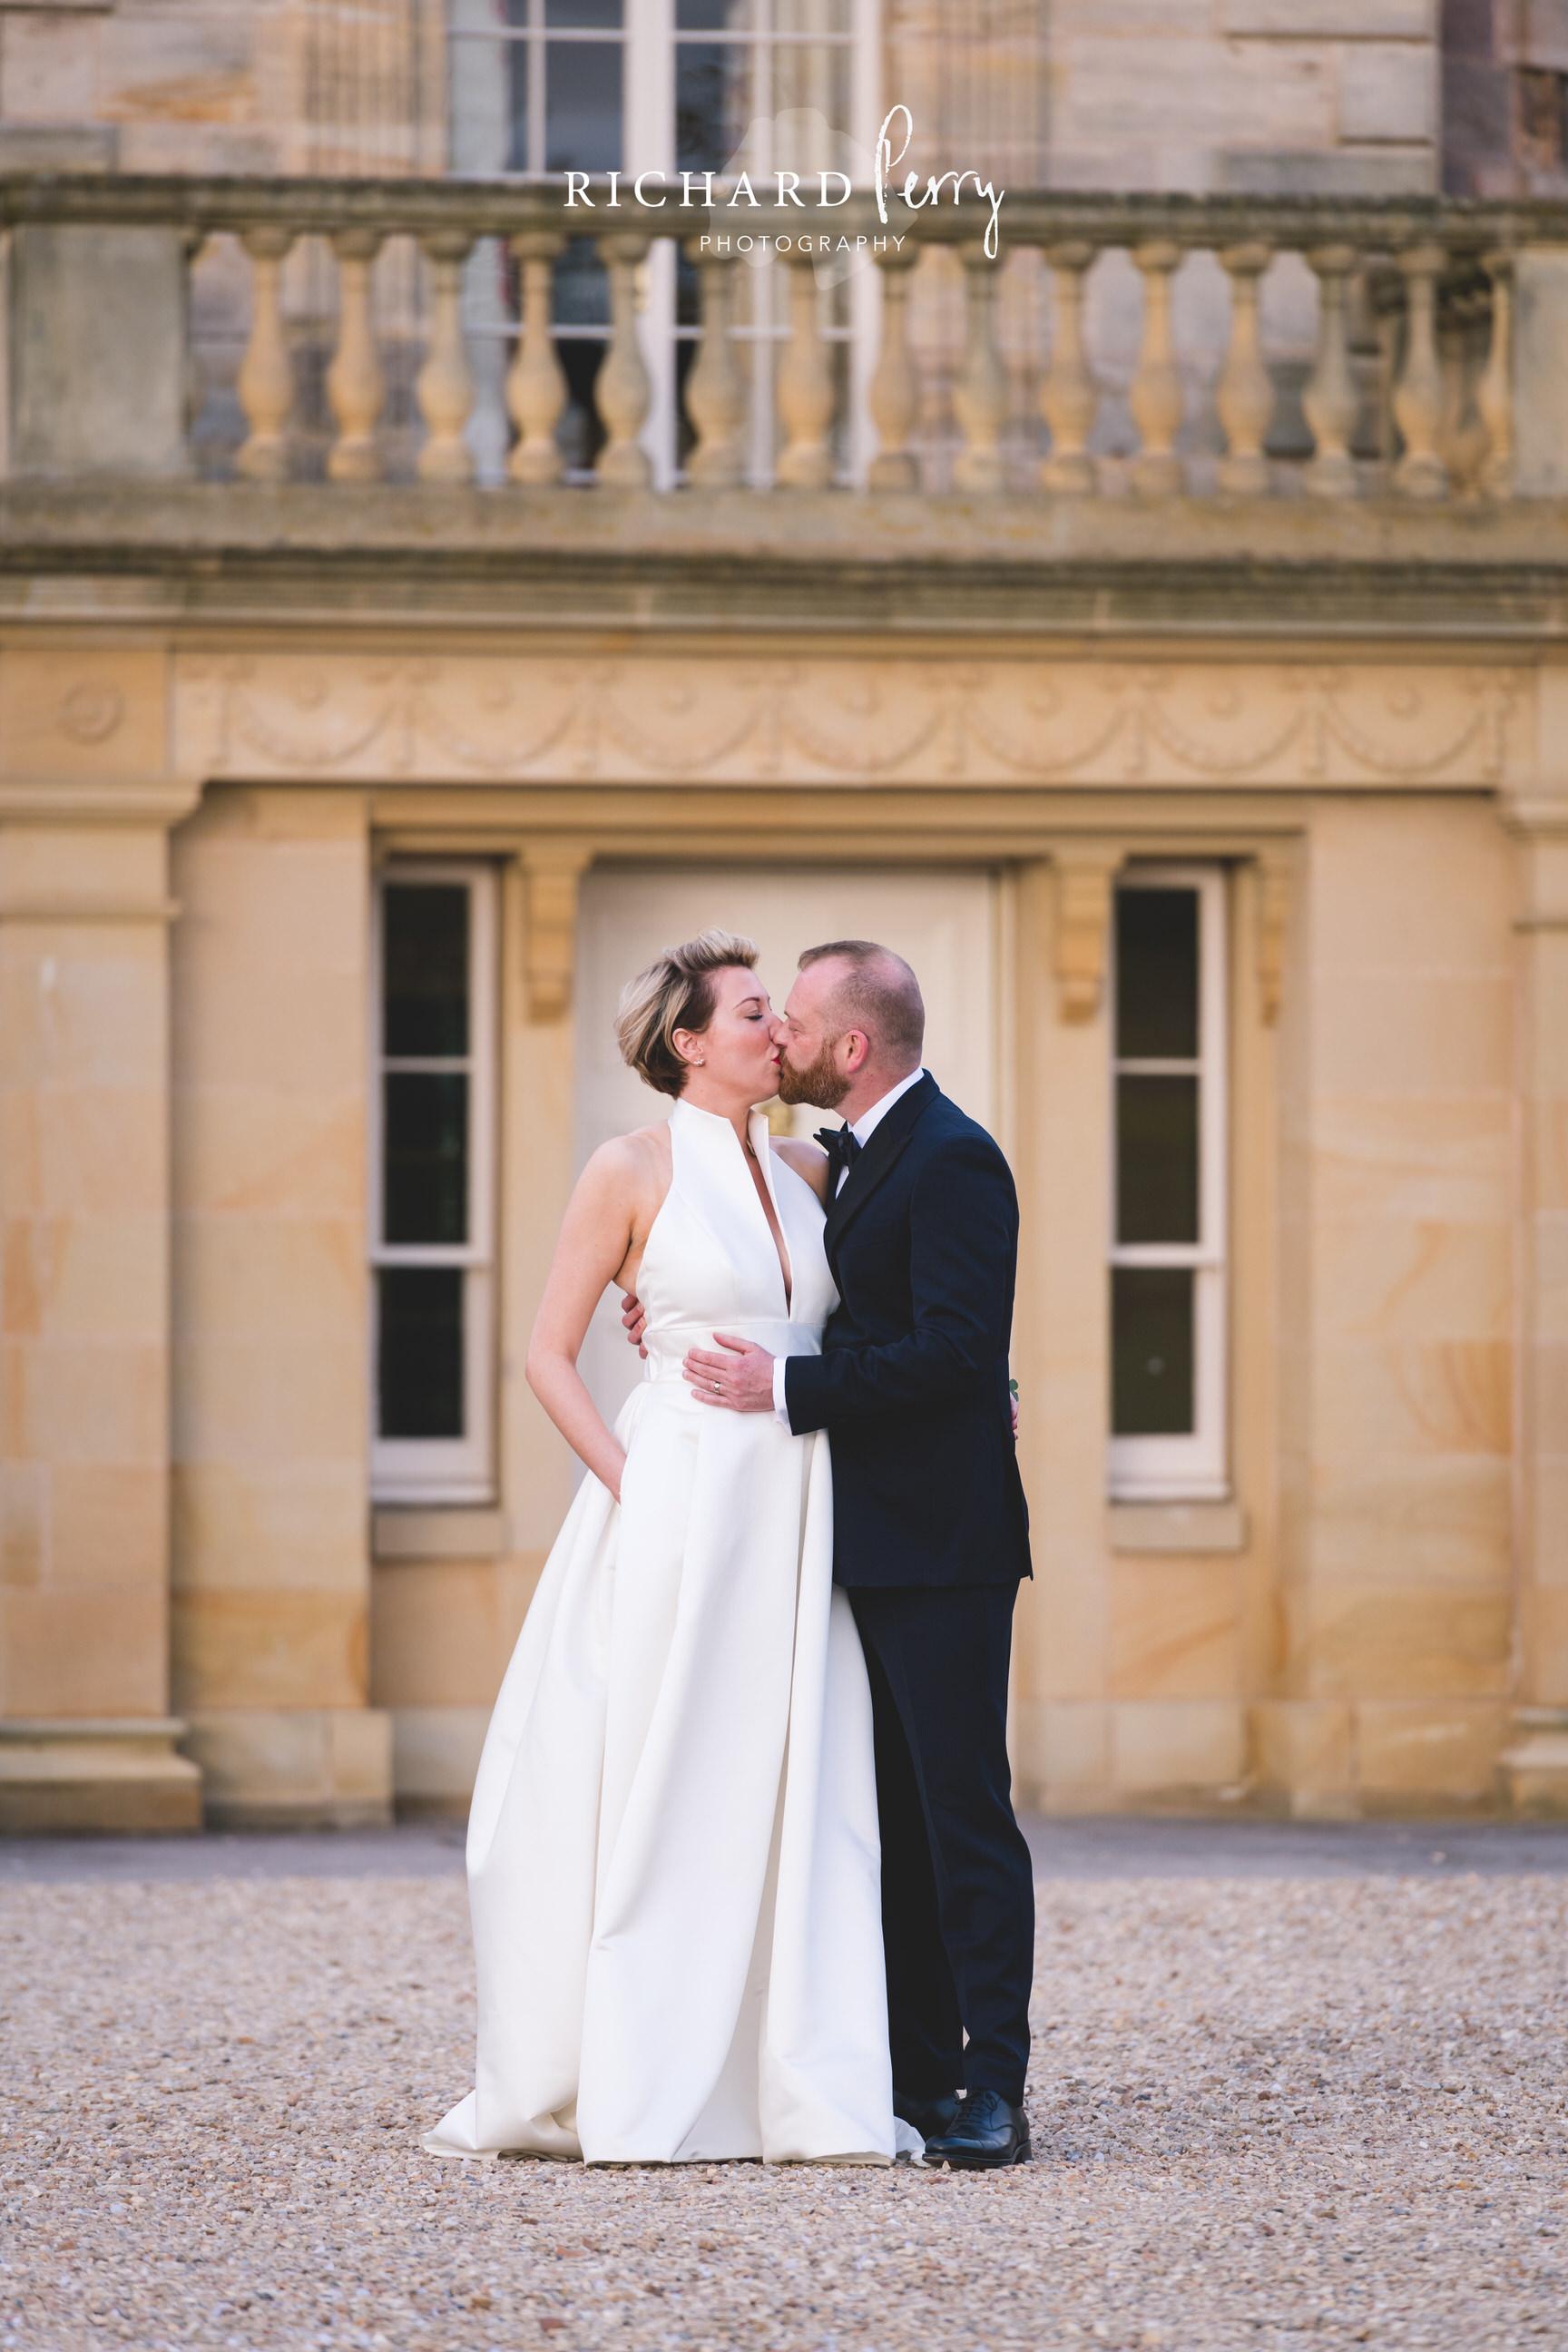 yorkshire-wedding-photographer-destination-archerfield-house-21.jpg